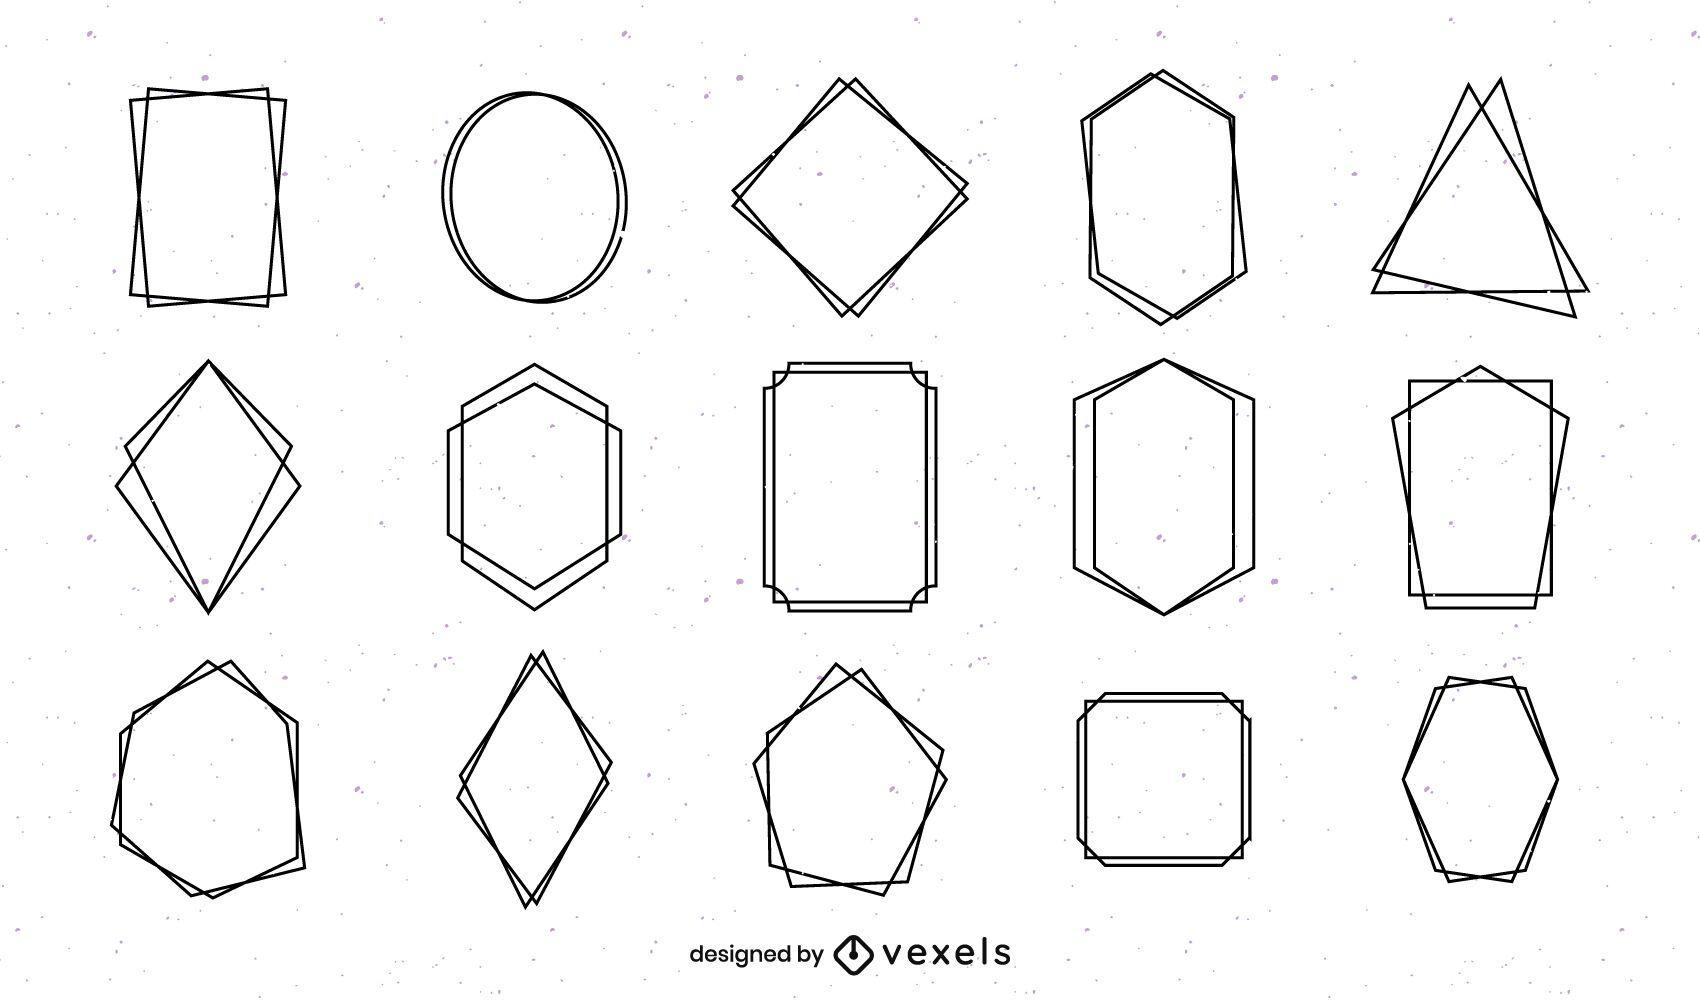 Pacote de moldura simples geométrica